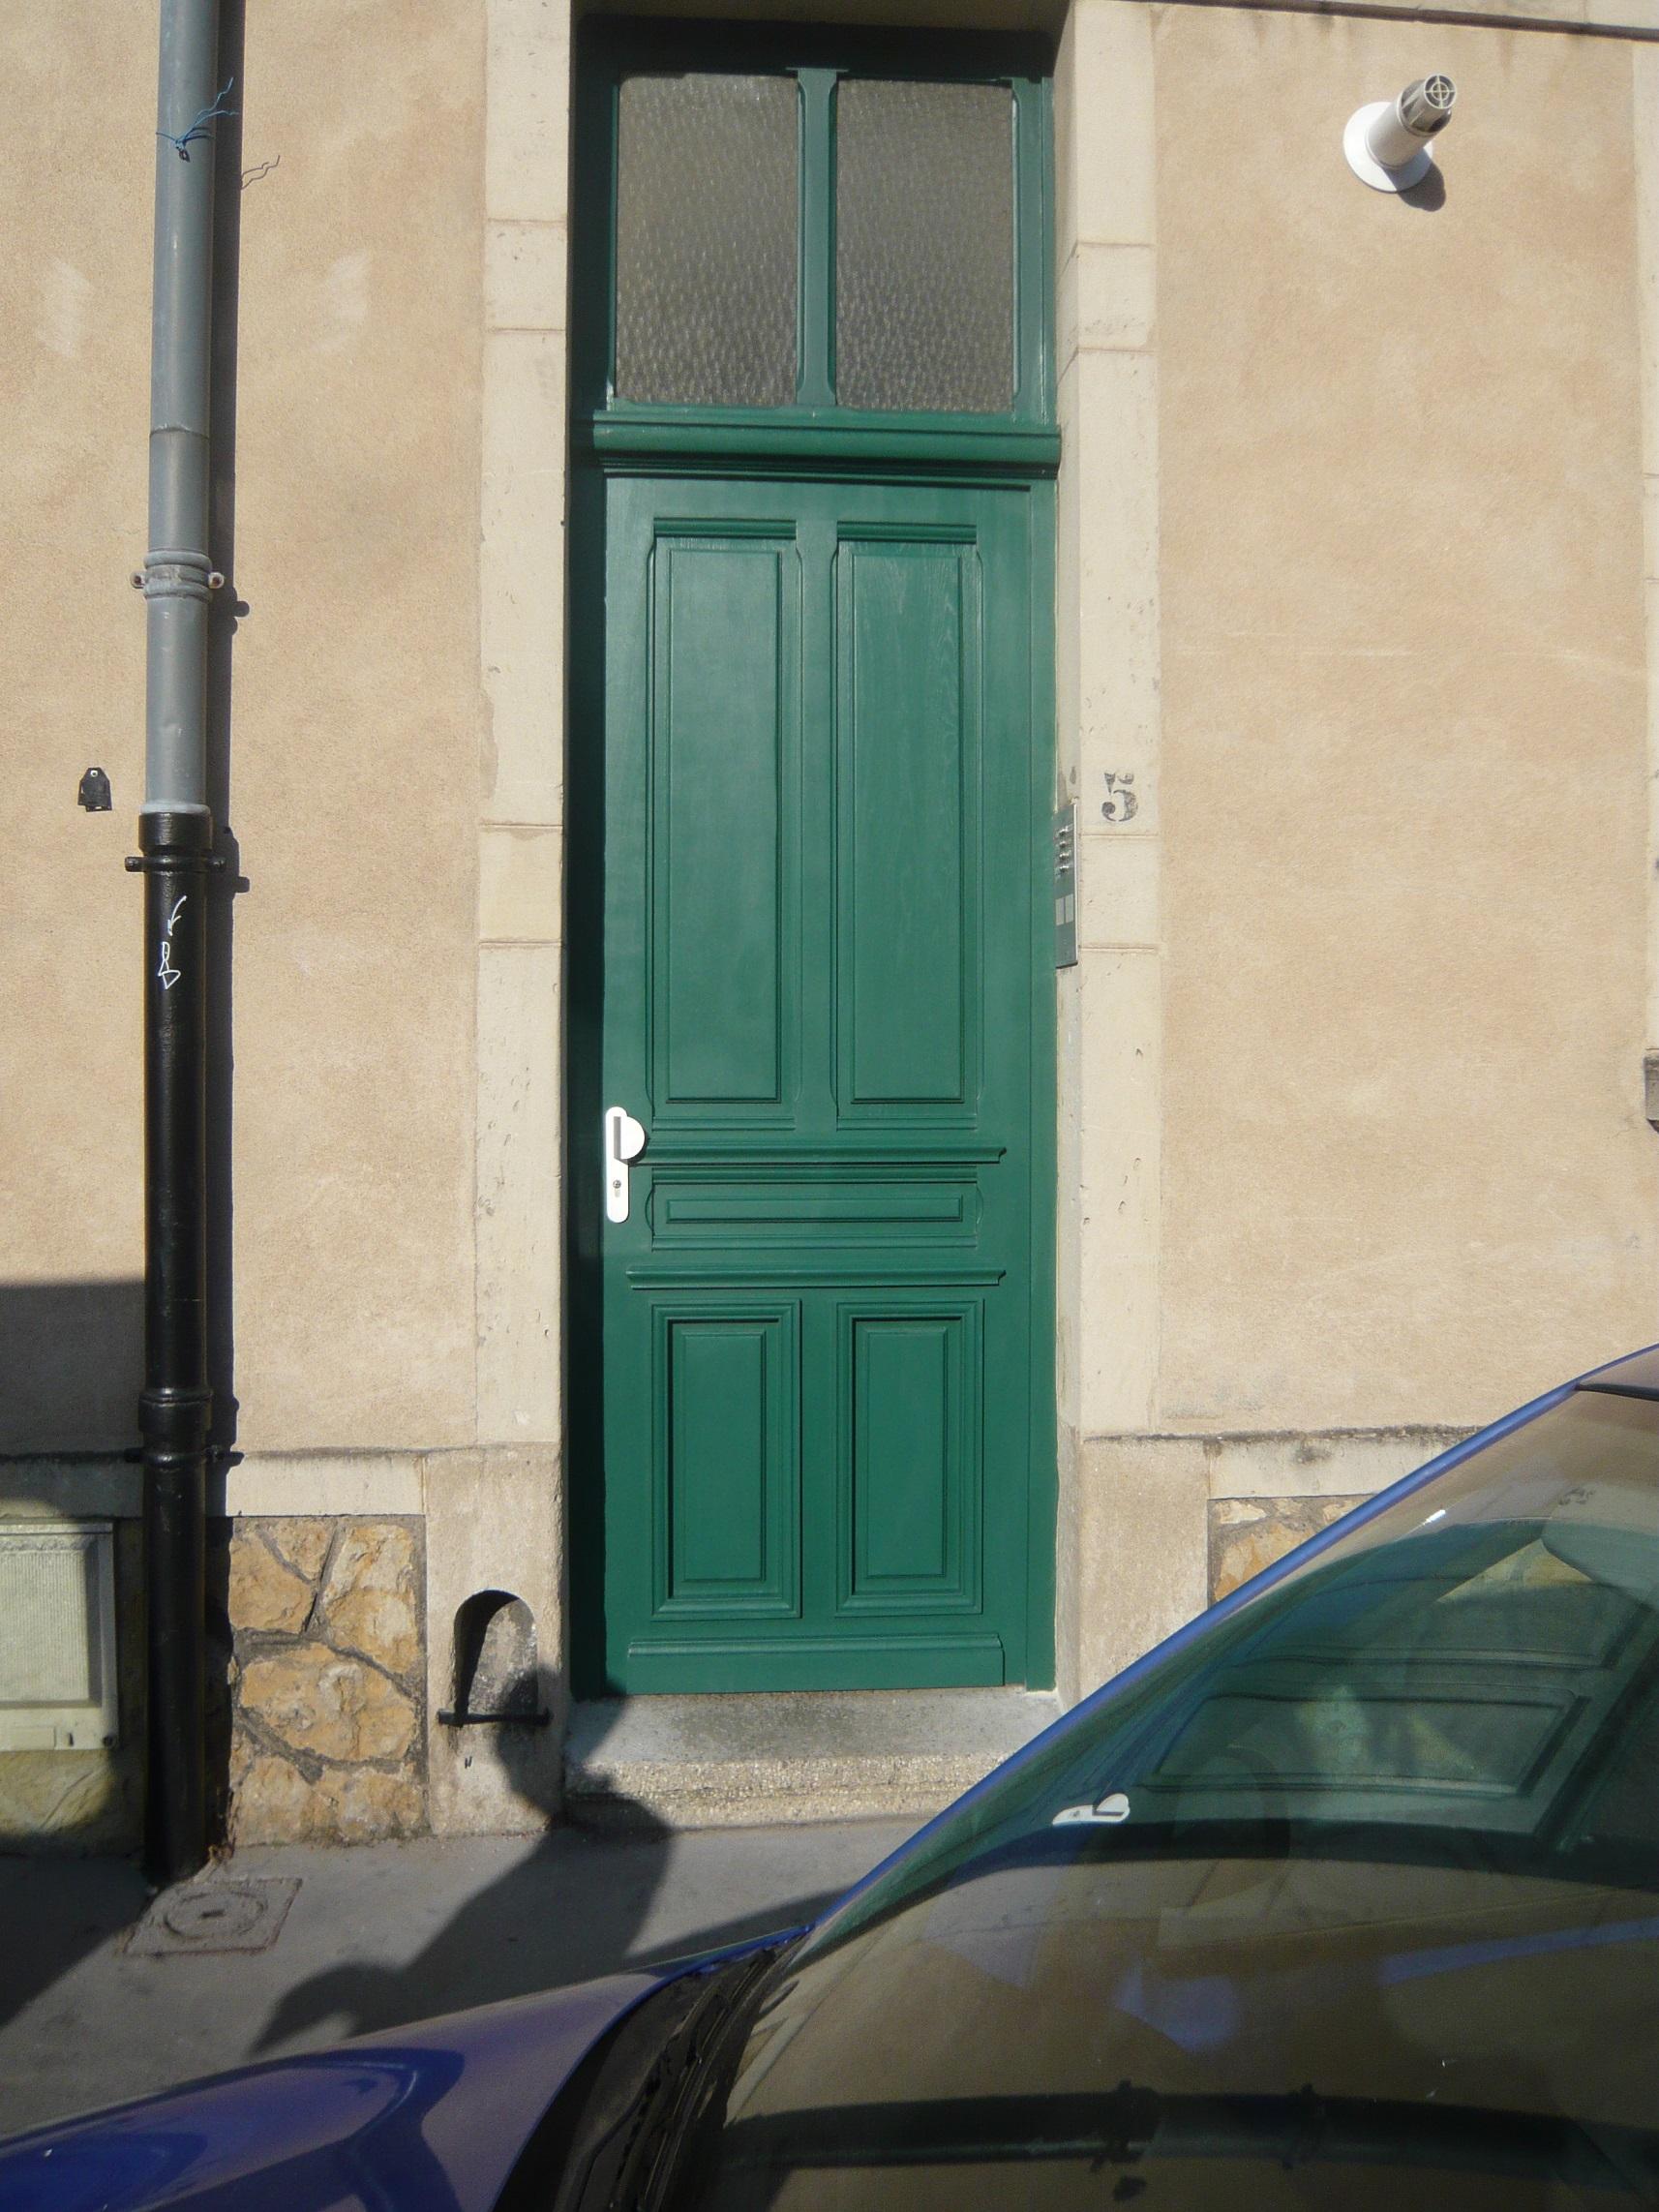 Porte d'entrée verte